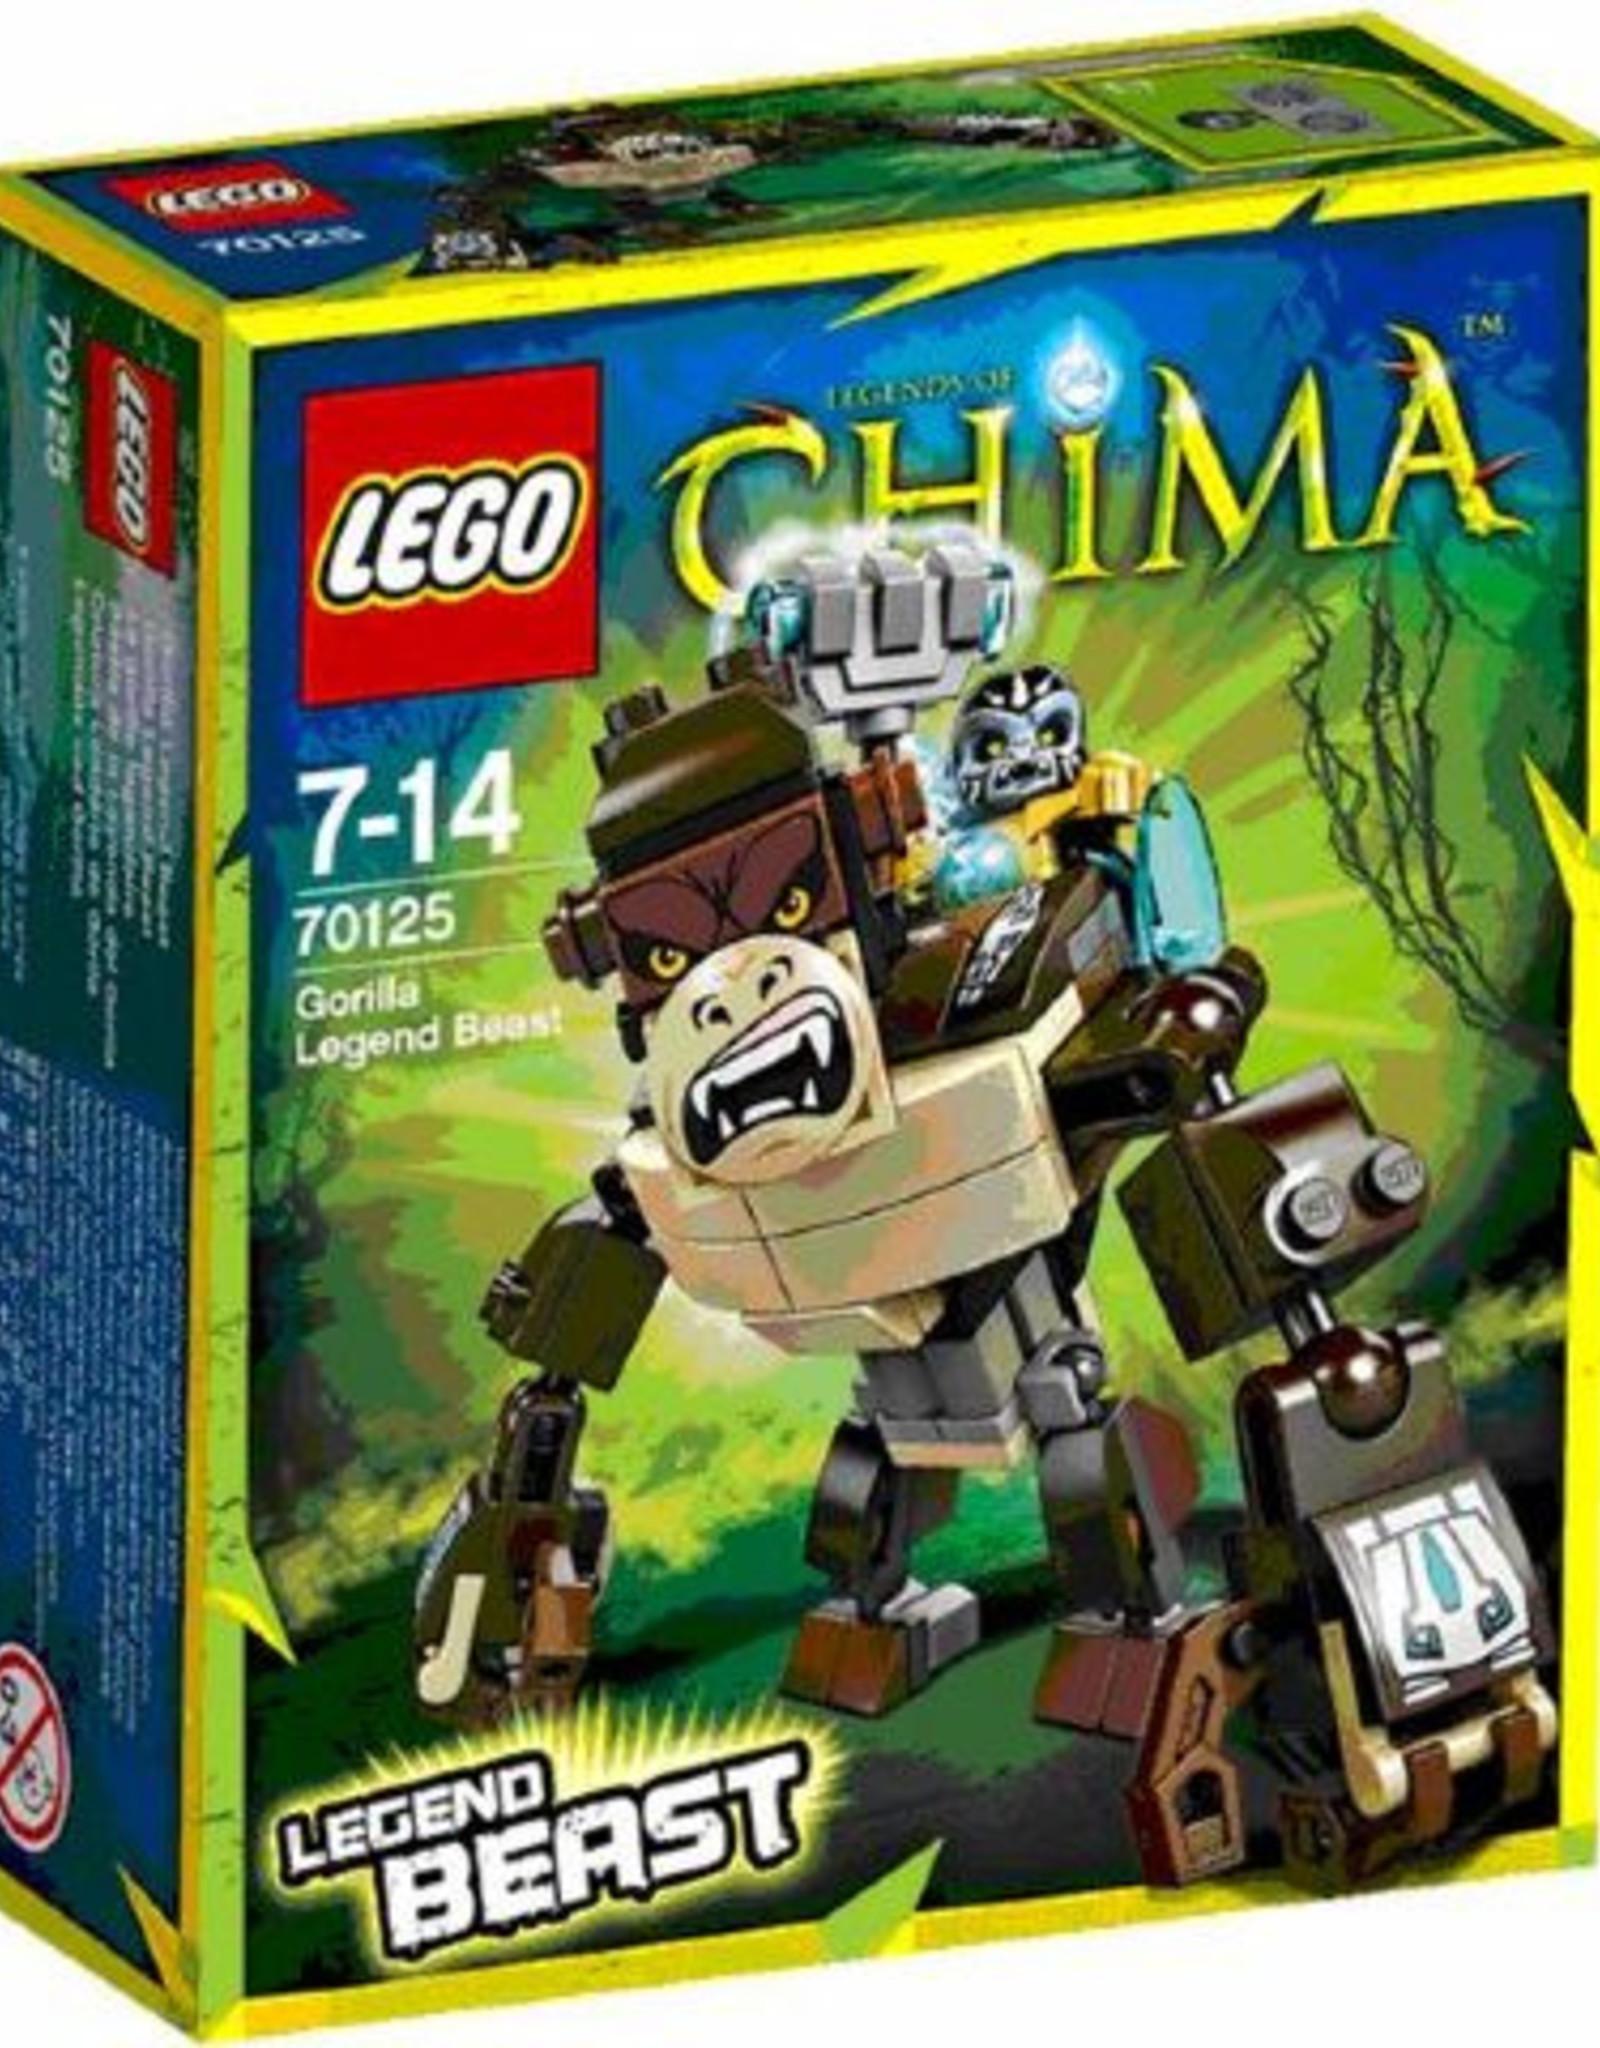 LEGO LEGO 70125 Gorilla Legende Beest CHIMA